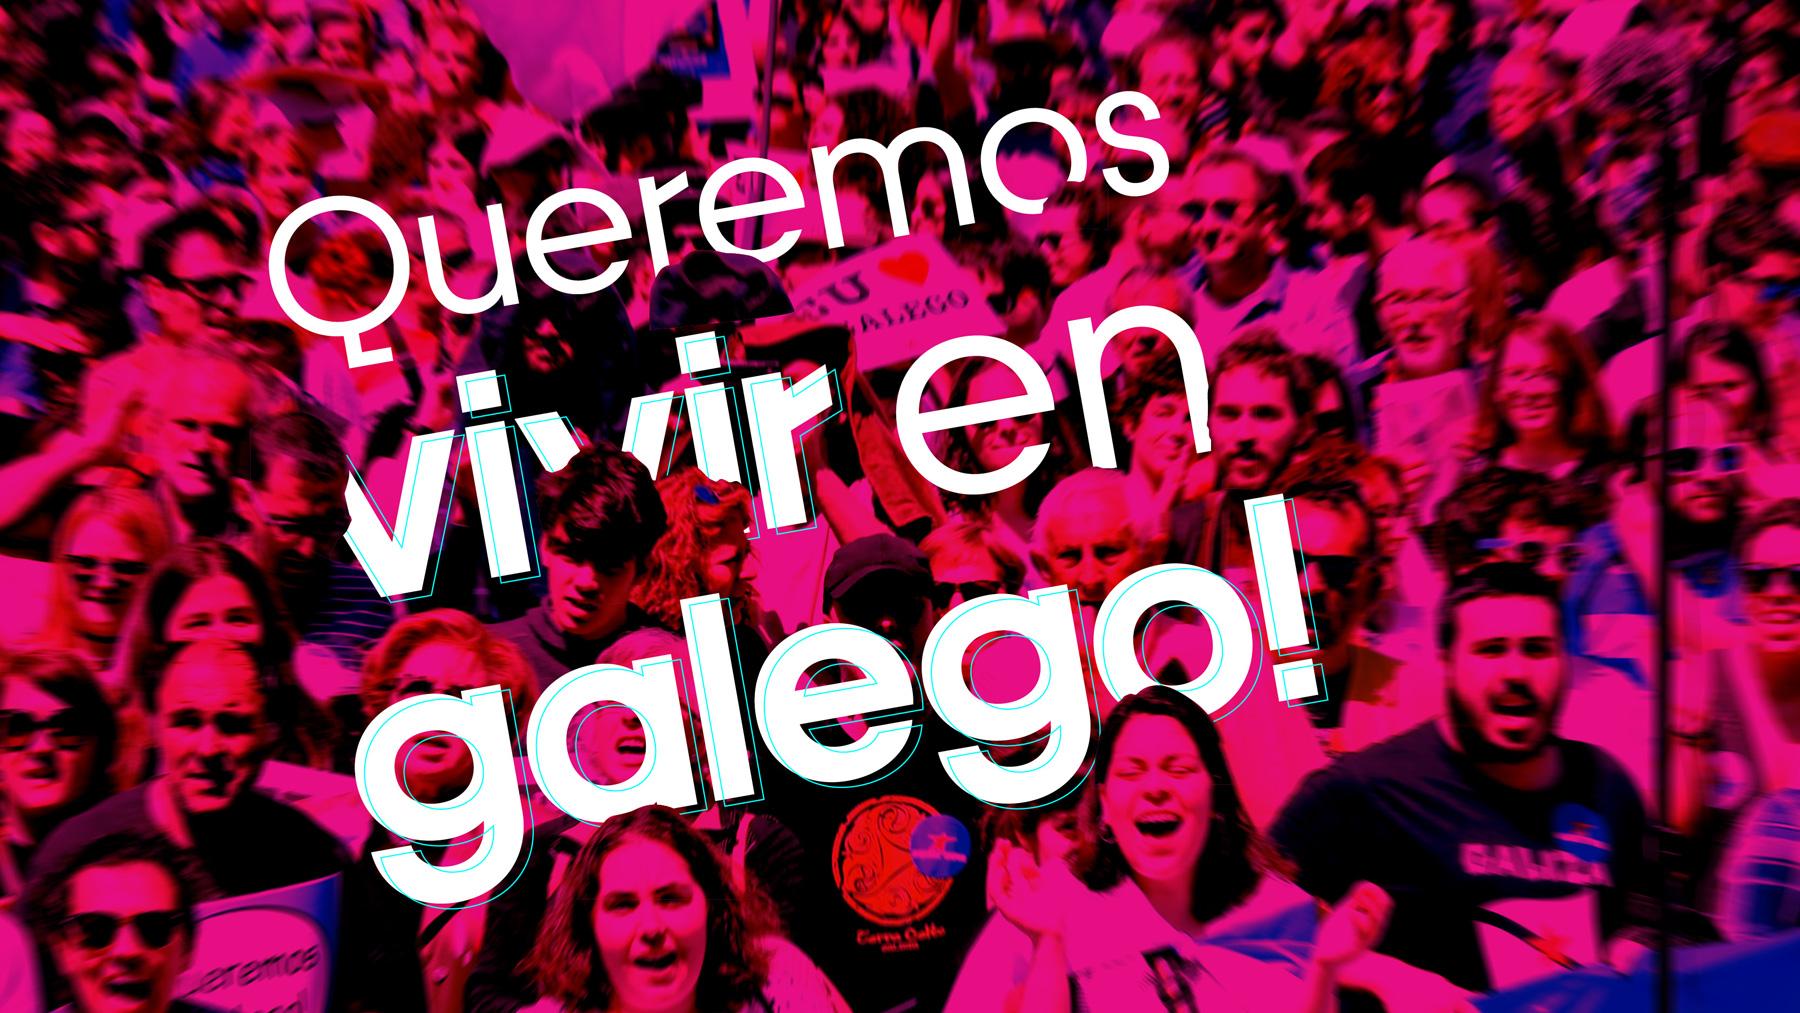 Queremos vivir en galego